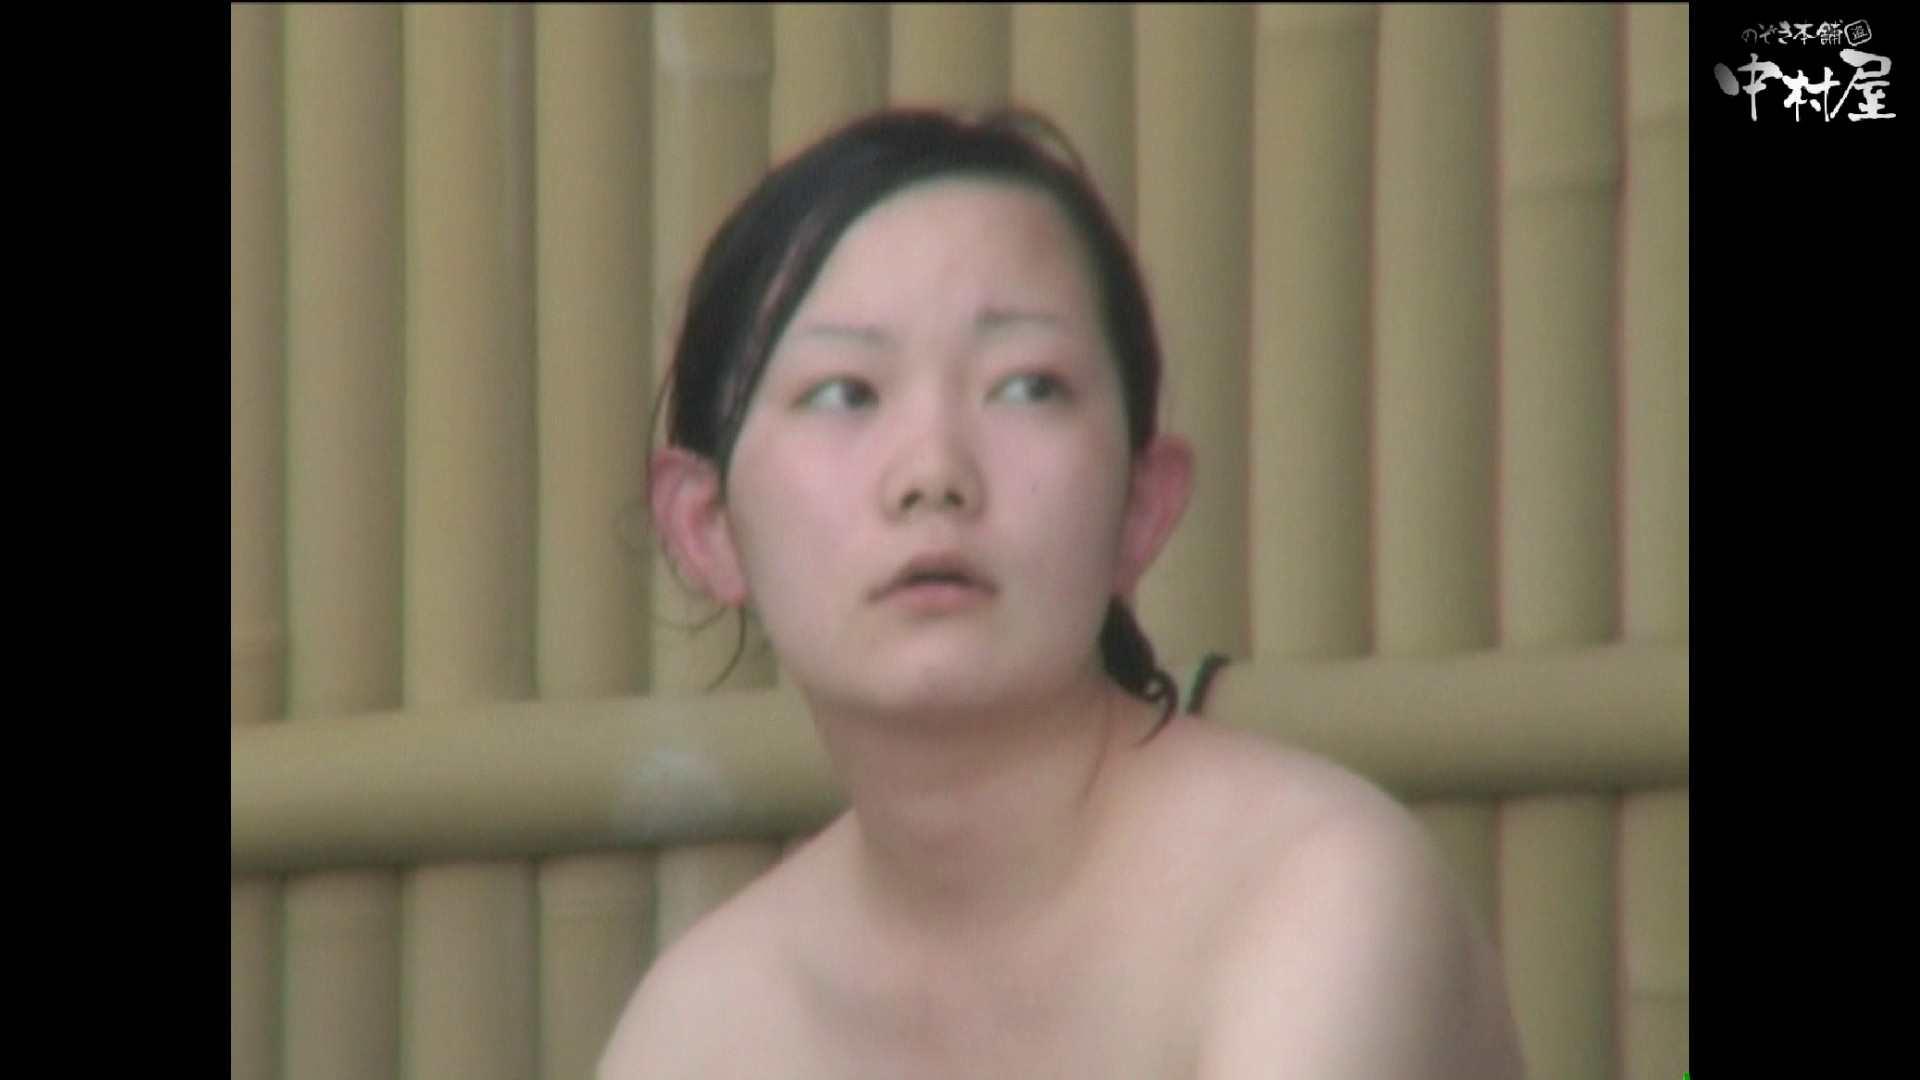 Aquaな露天風呂Vol.892 露天風呂   OLのエロ生活  39連発 7